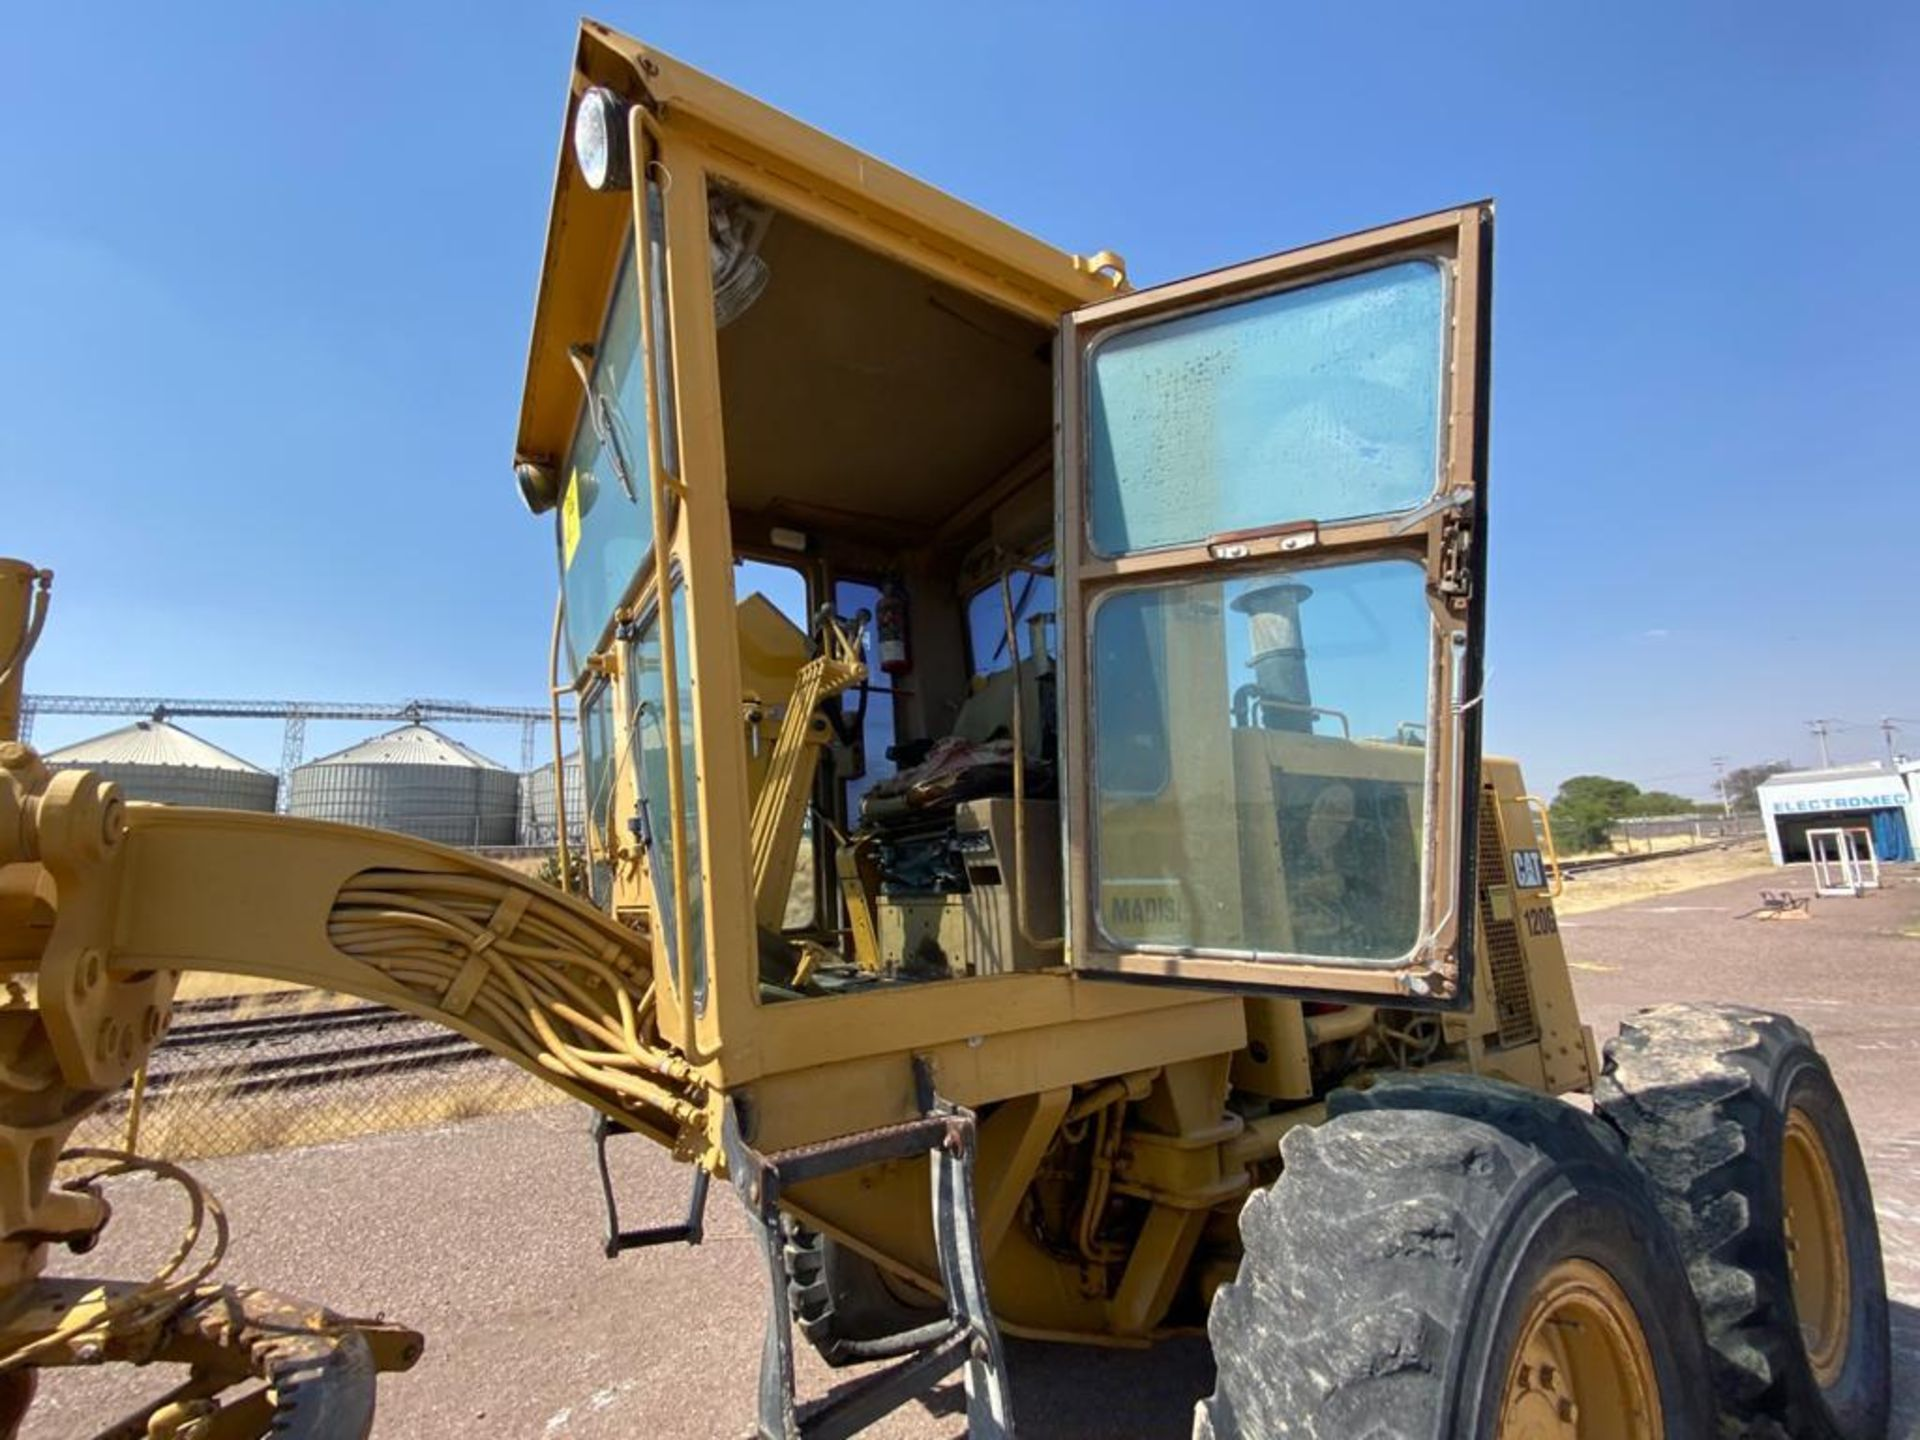 Caterpillar 120G Motor Grader, Serial number 87V09646, Motor number PQ883-2/07Z28983 - Image 34 of 61